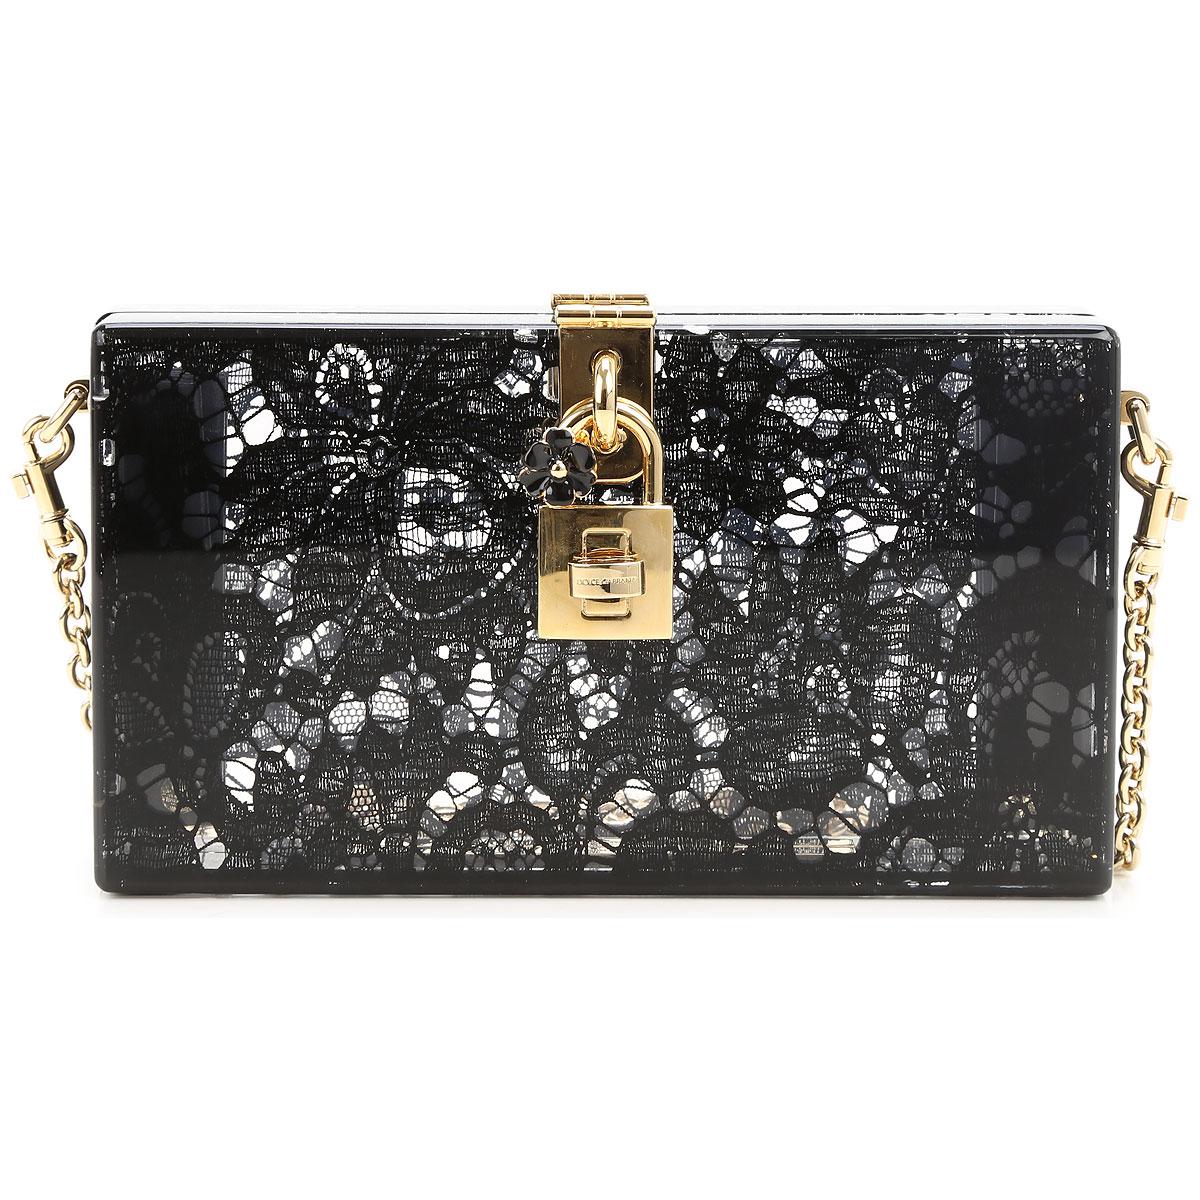 Dolce & Gabbana Clutch Bag, Black, PVC, 2017